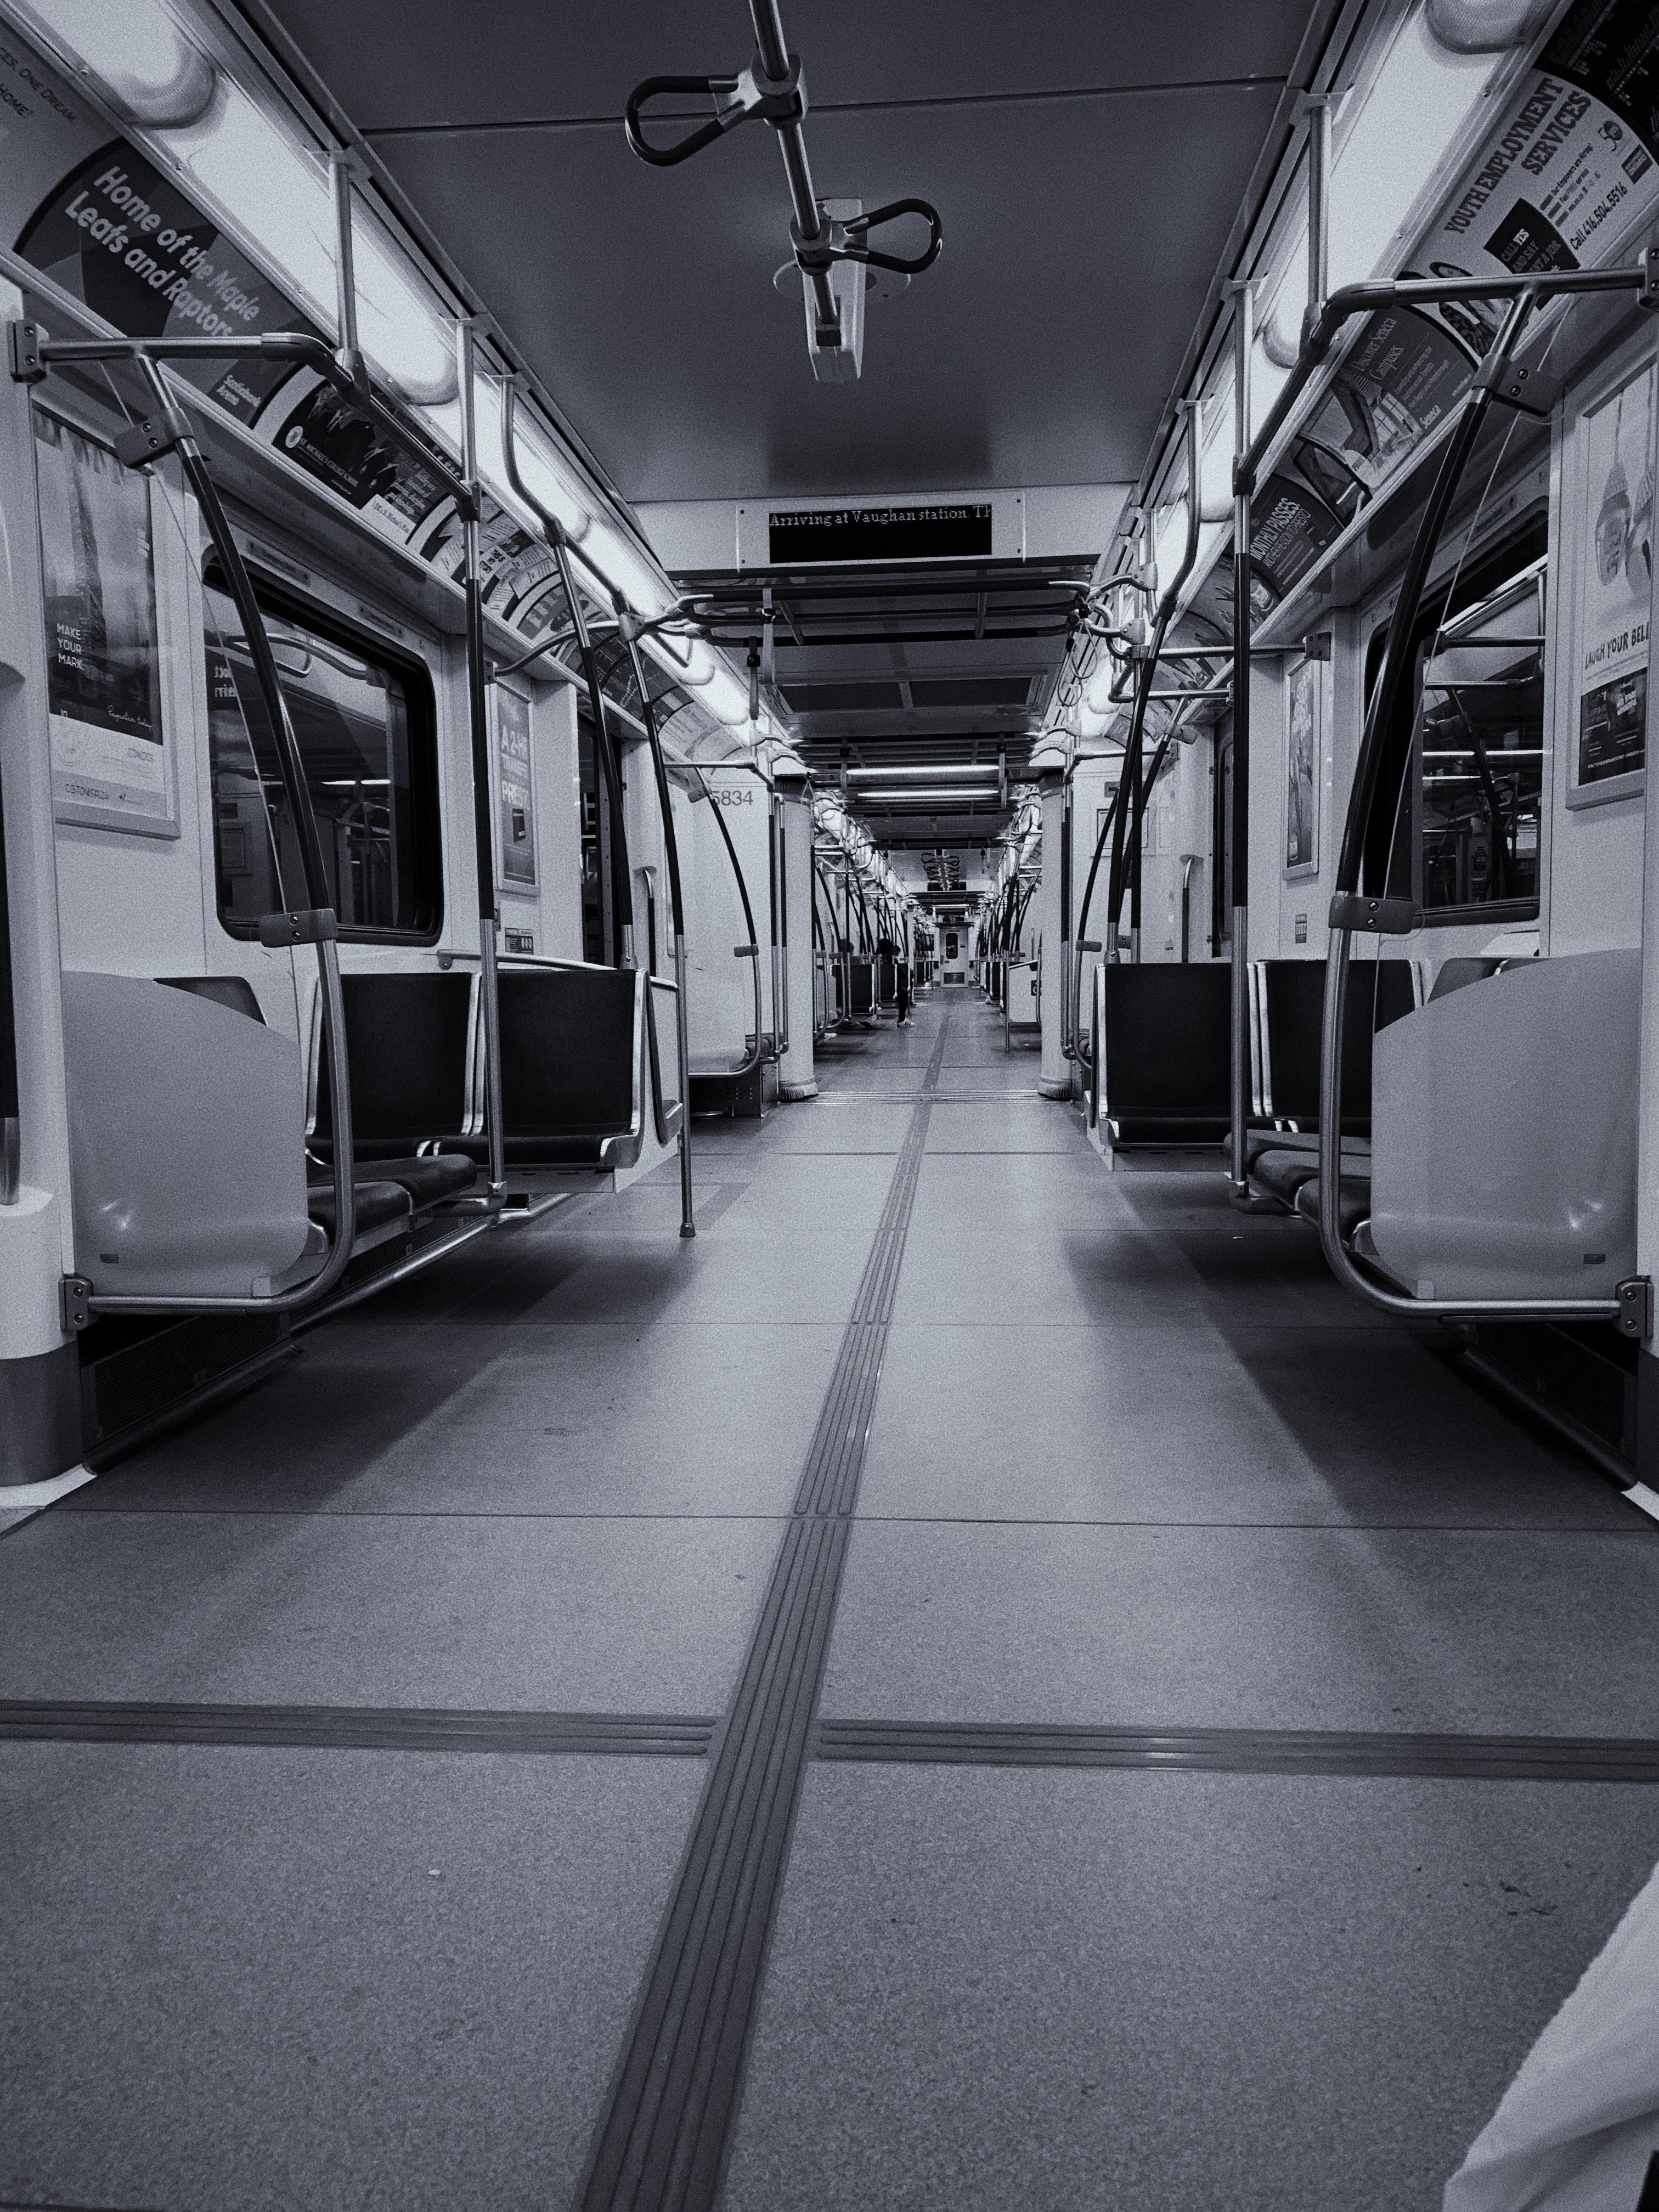 Free stock photo of city life, lonely, public transportation